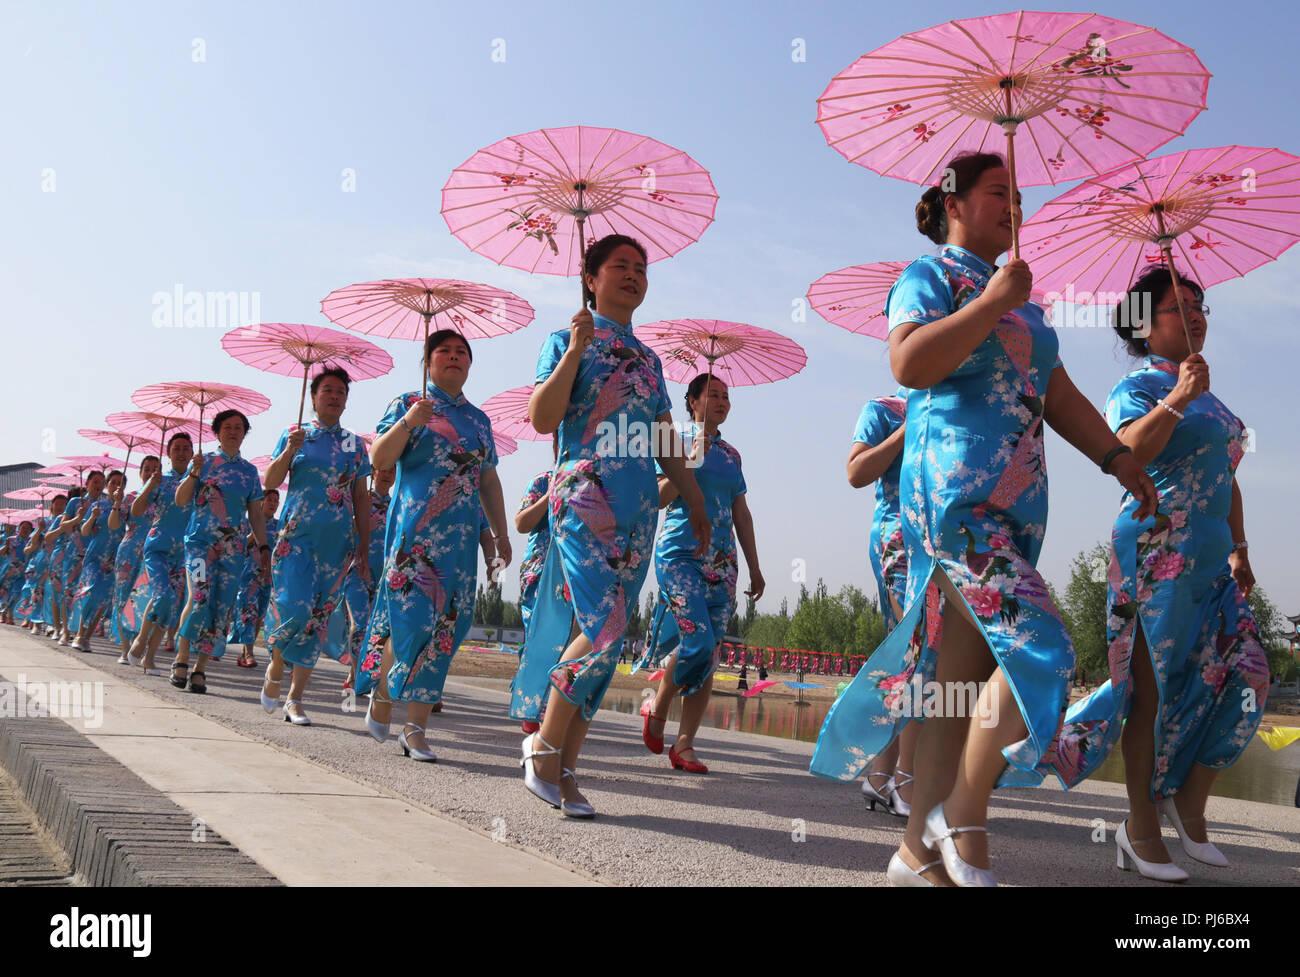 Zhangjiakou, Zhangjiakou, China. 5th Sep, 2018. Zhangjiakou, CHINA-Women present various cheongsams at a cheongsam show held in Zhangjiakou, north China's Hebei Province. Credit: SIPA Asia/ZUMA Wire/Alamy Live News - Stock Image